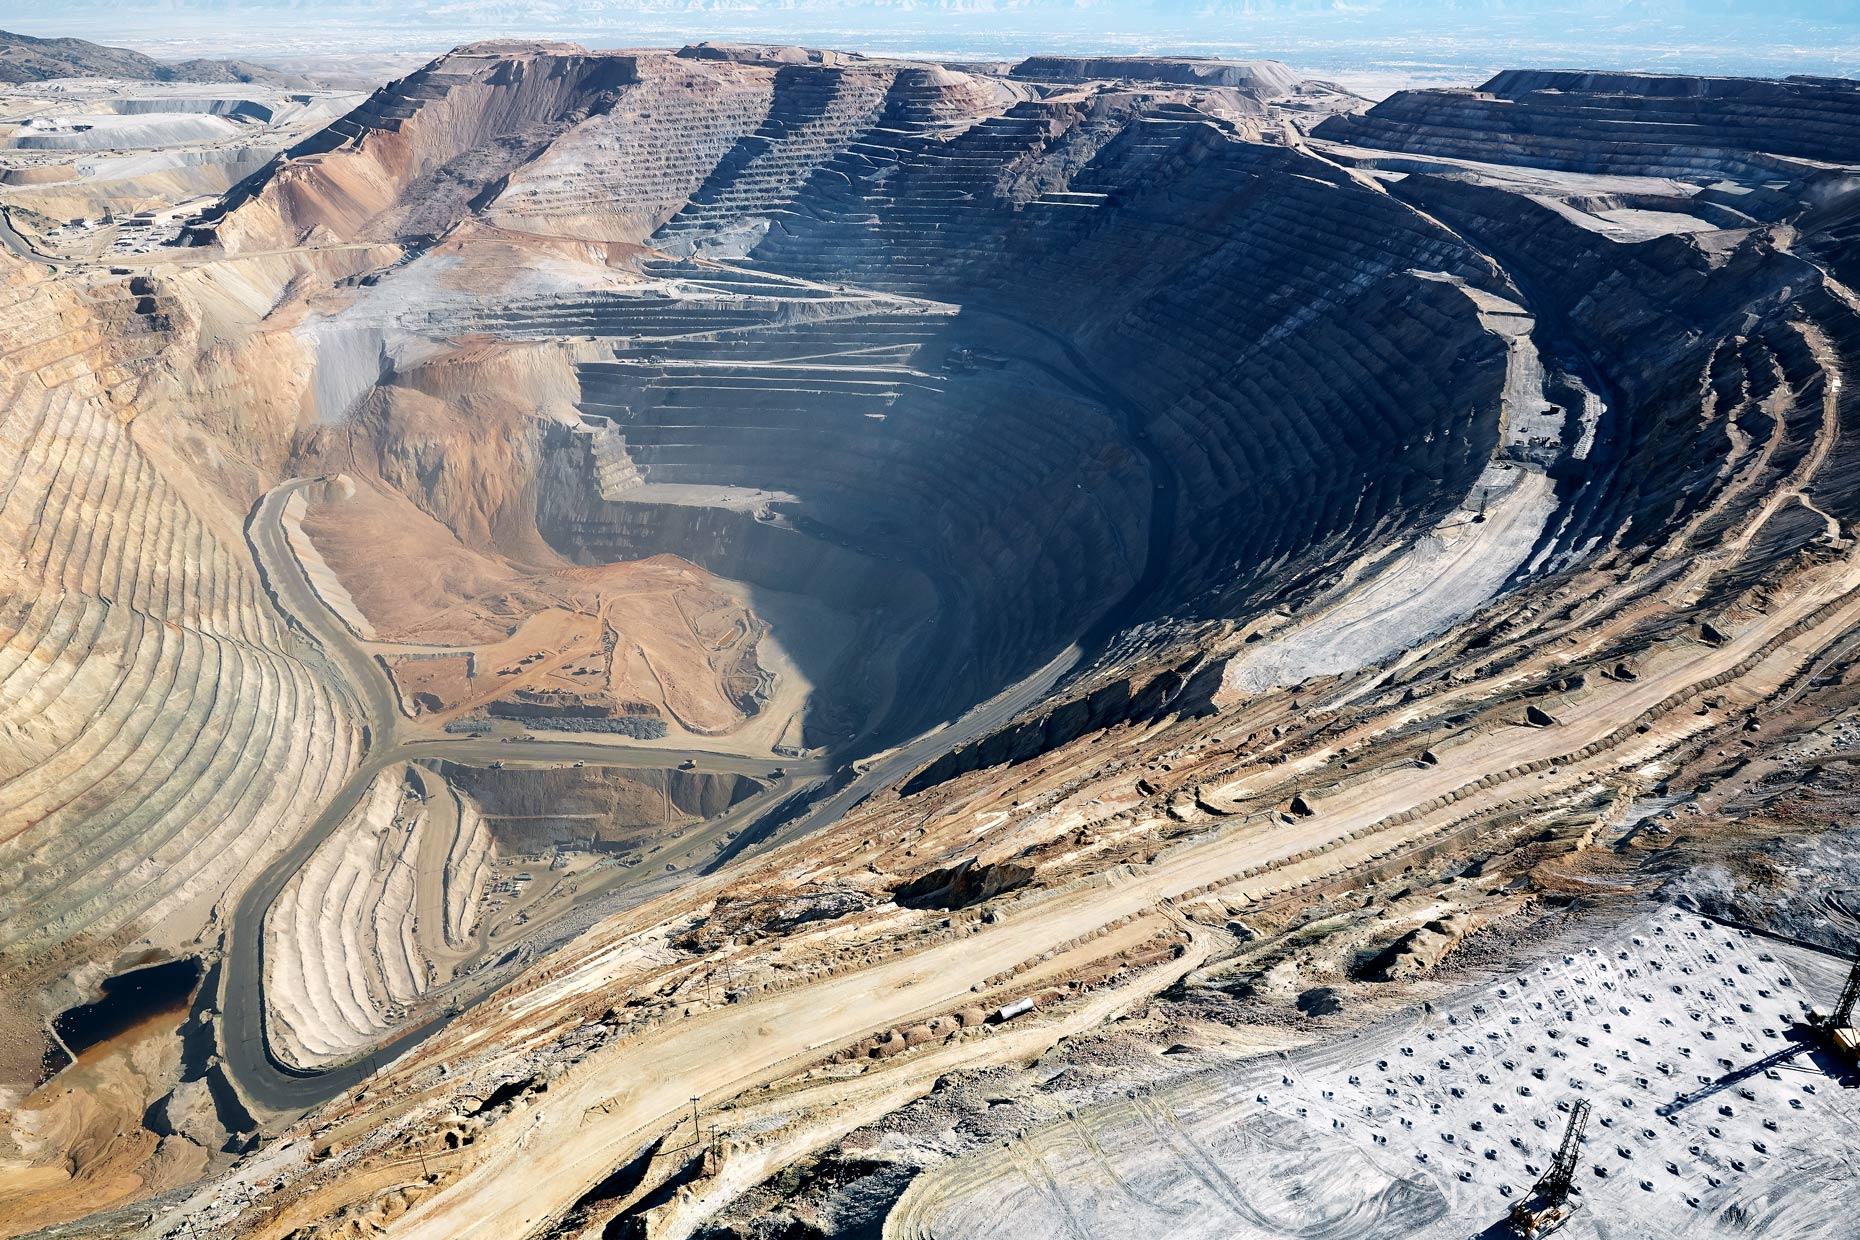 Travel Photography Derek Israelsen 015 Copper Mines Aerial